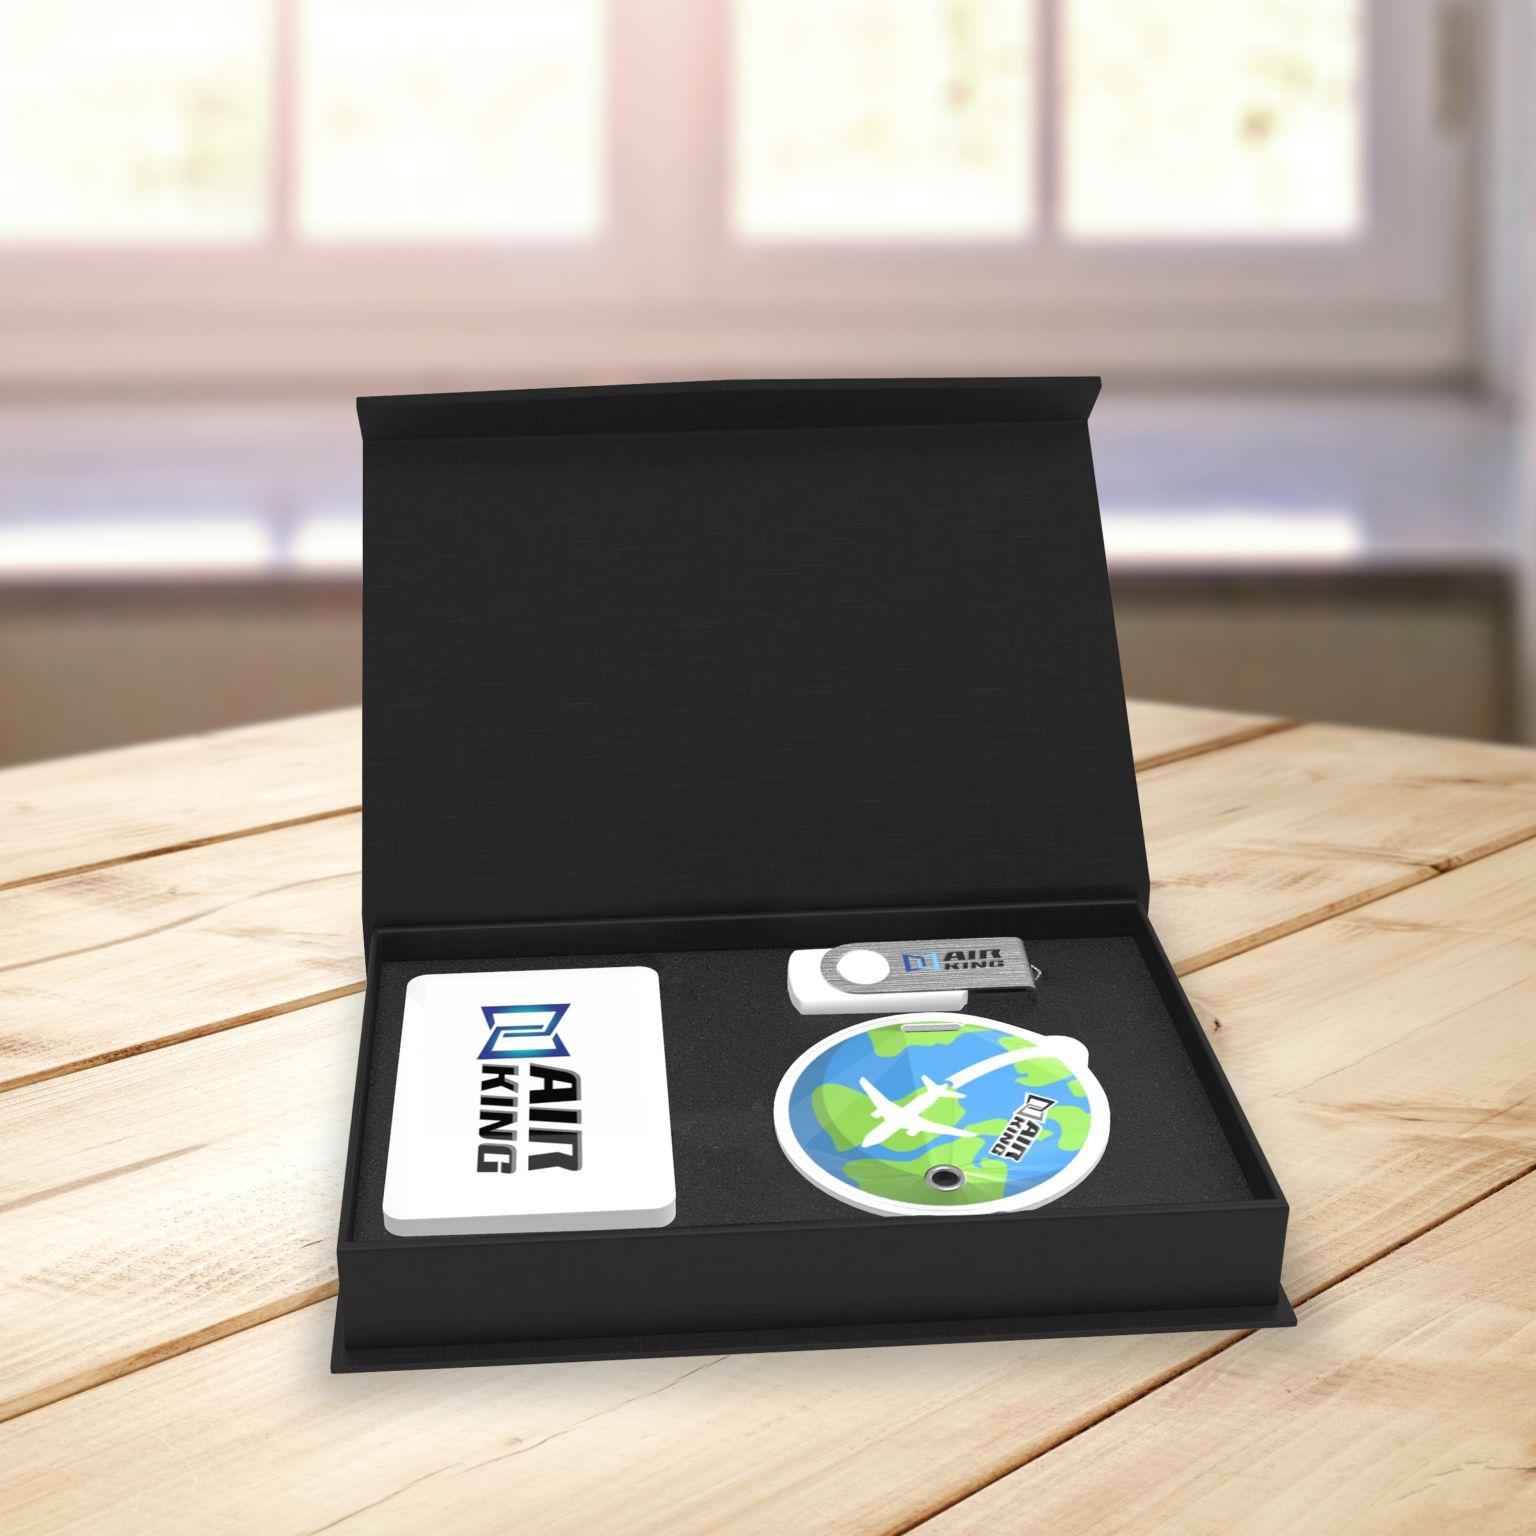 Travel gift set Noir - ISOCOM - OBJETS ET TEXTILES PERSONNALISES - NANTES